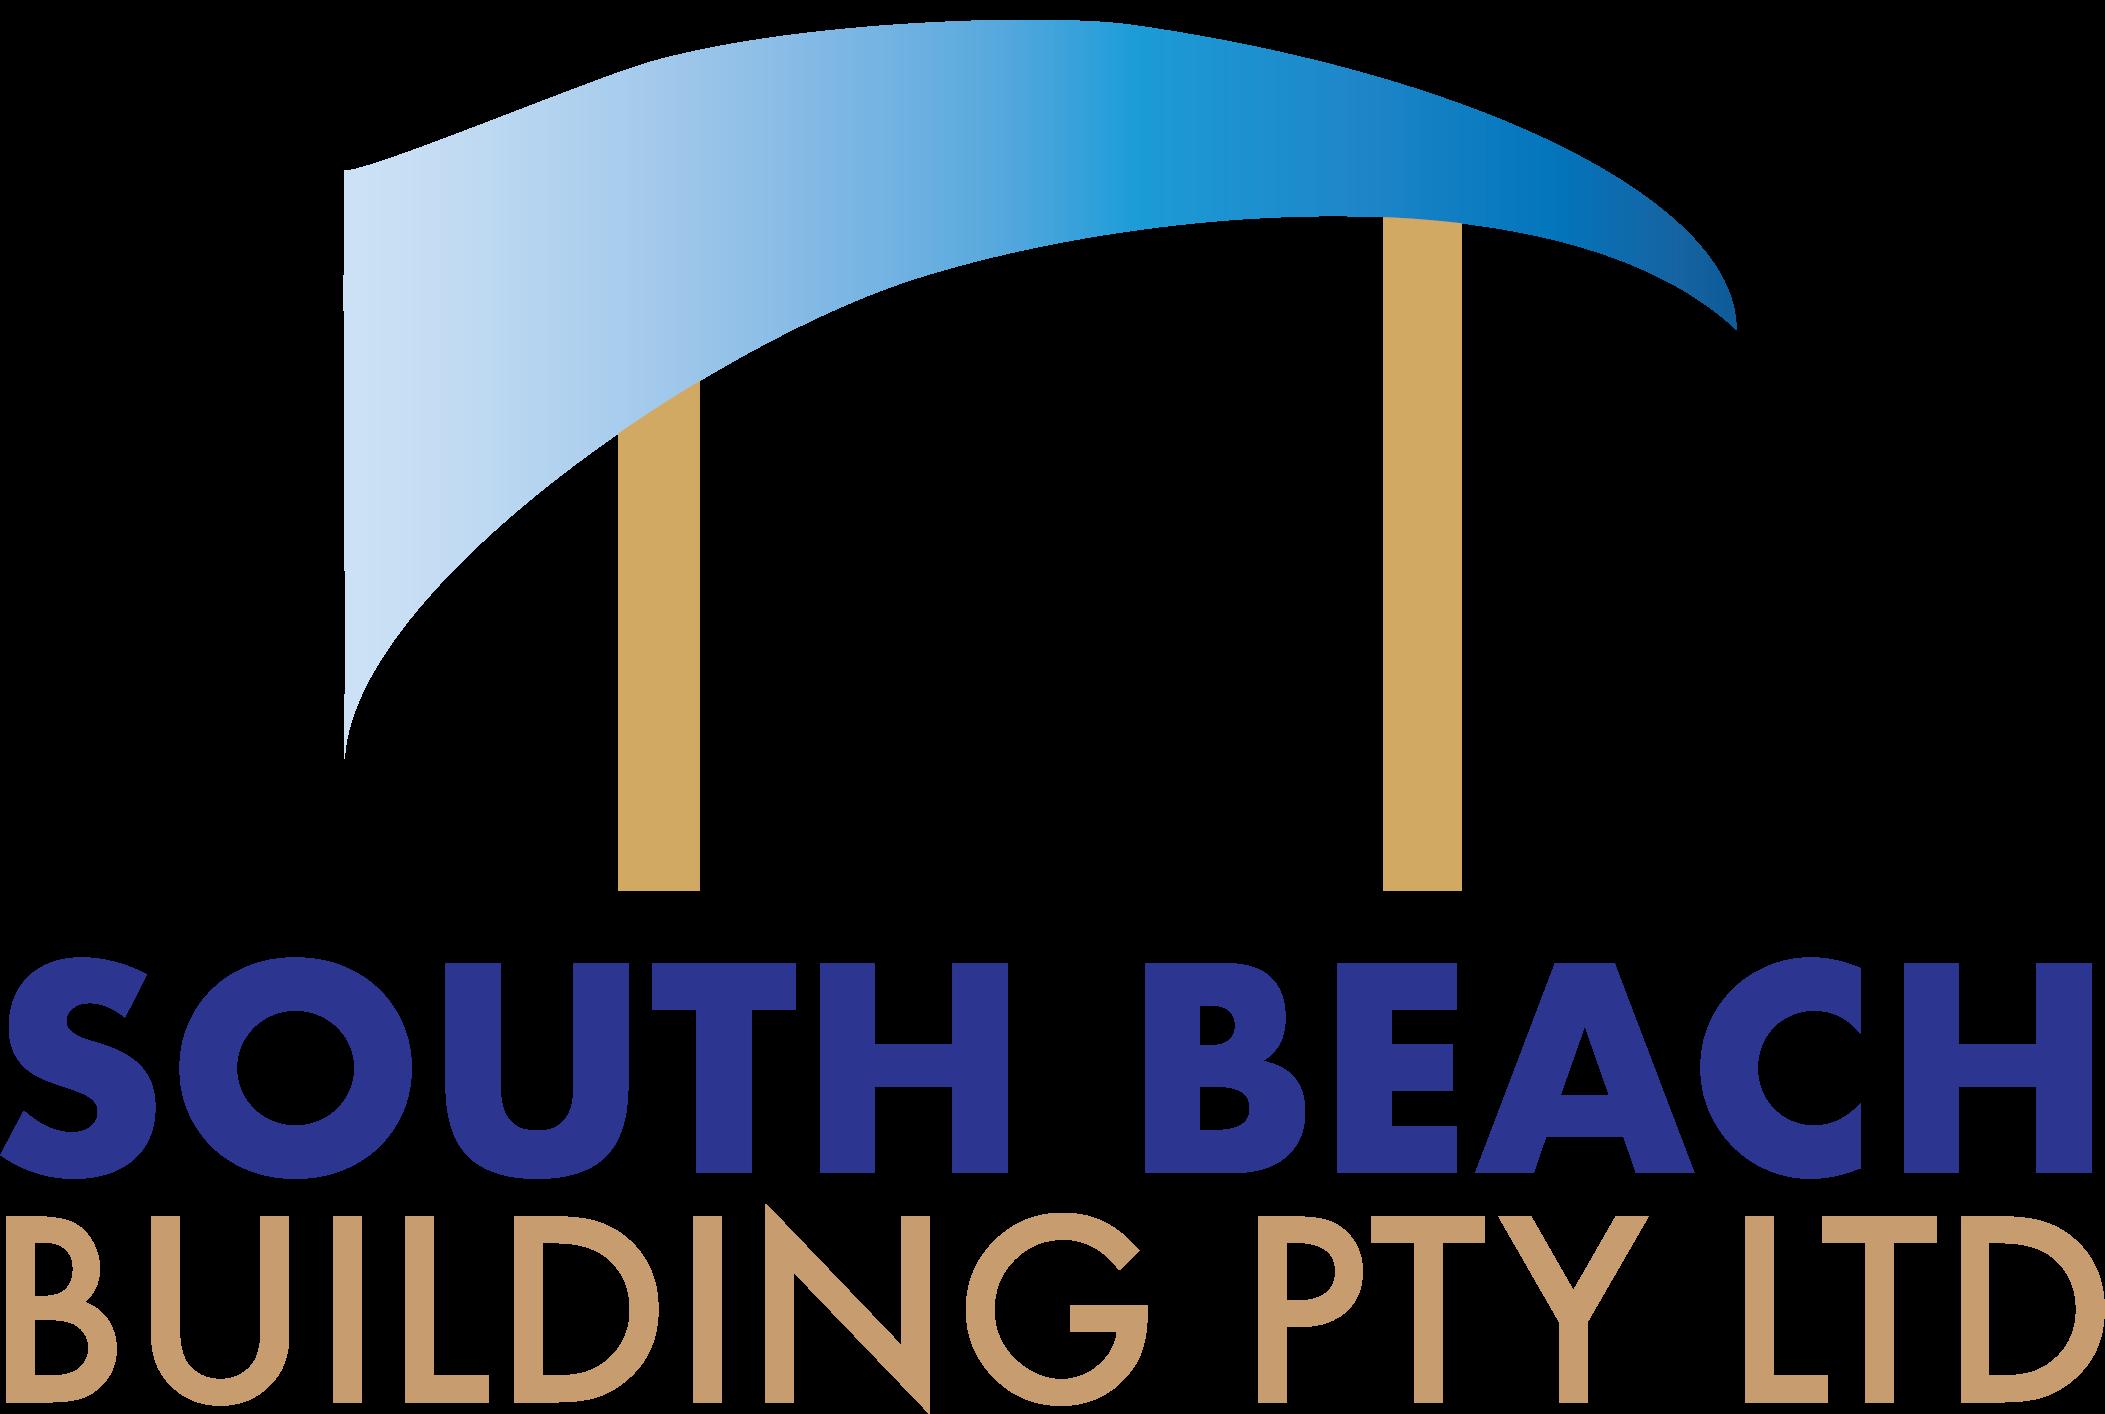 South Beach Building